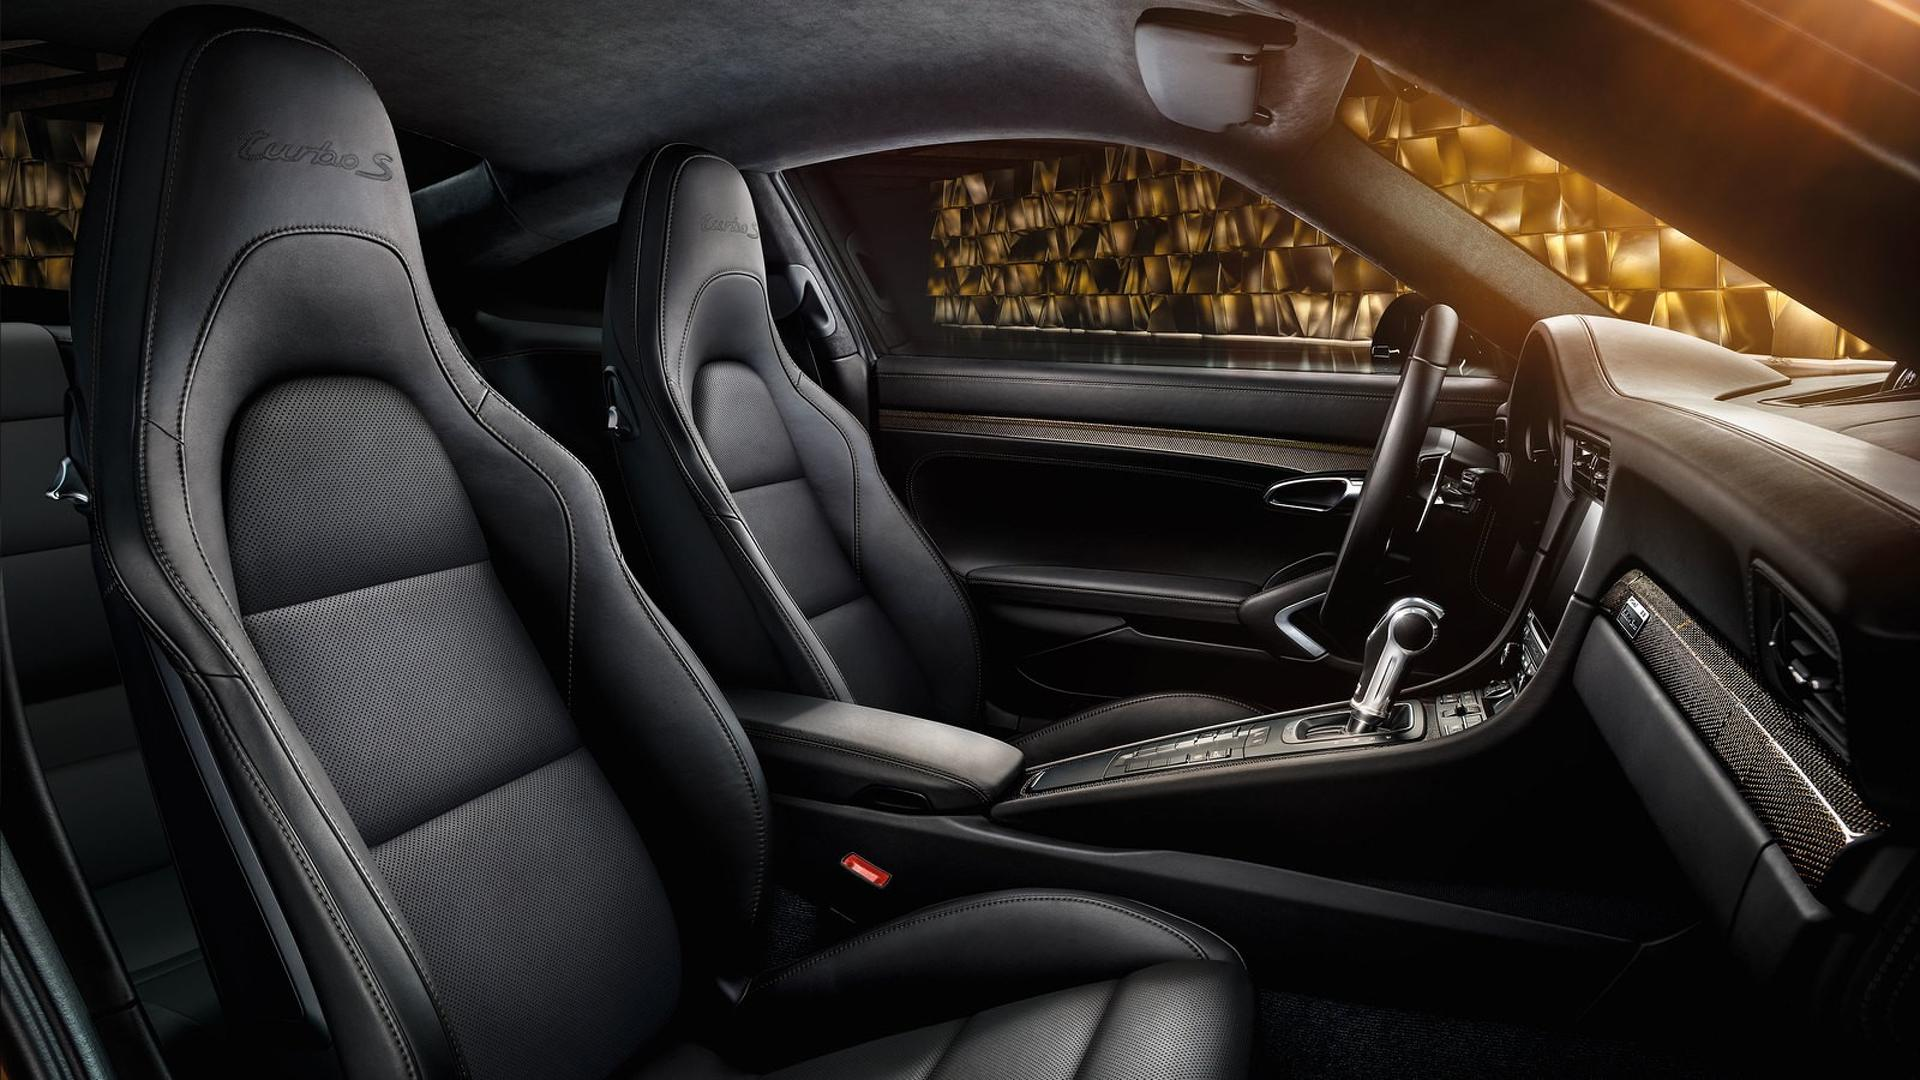 Porsche_911_Turbo_S_Exclusive_Series_27